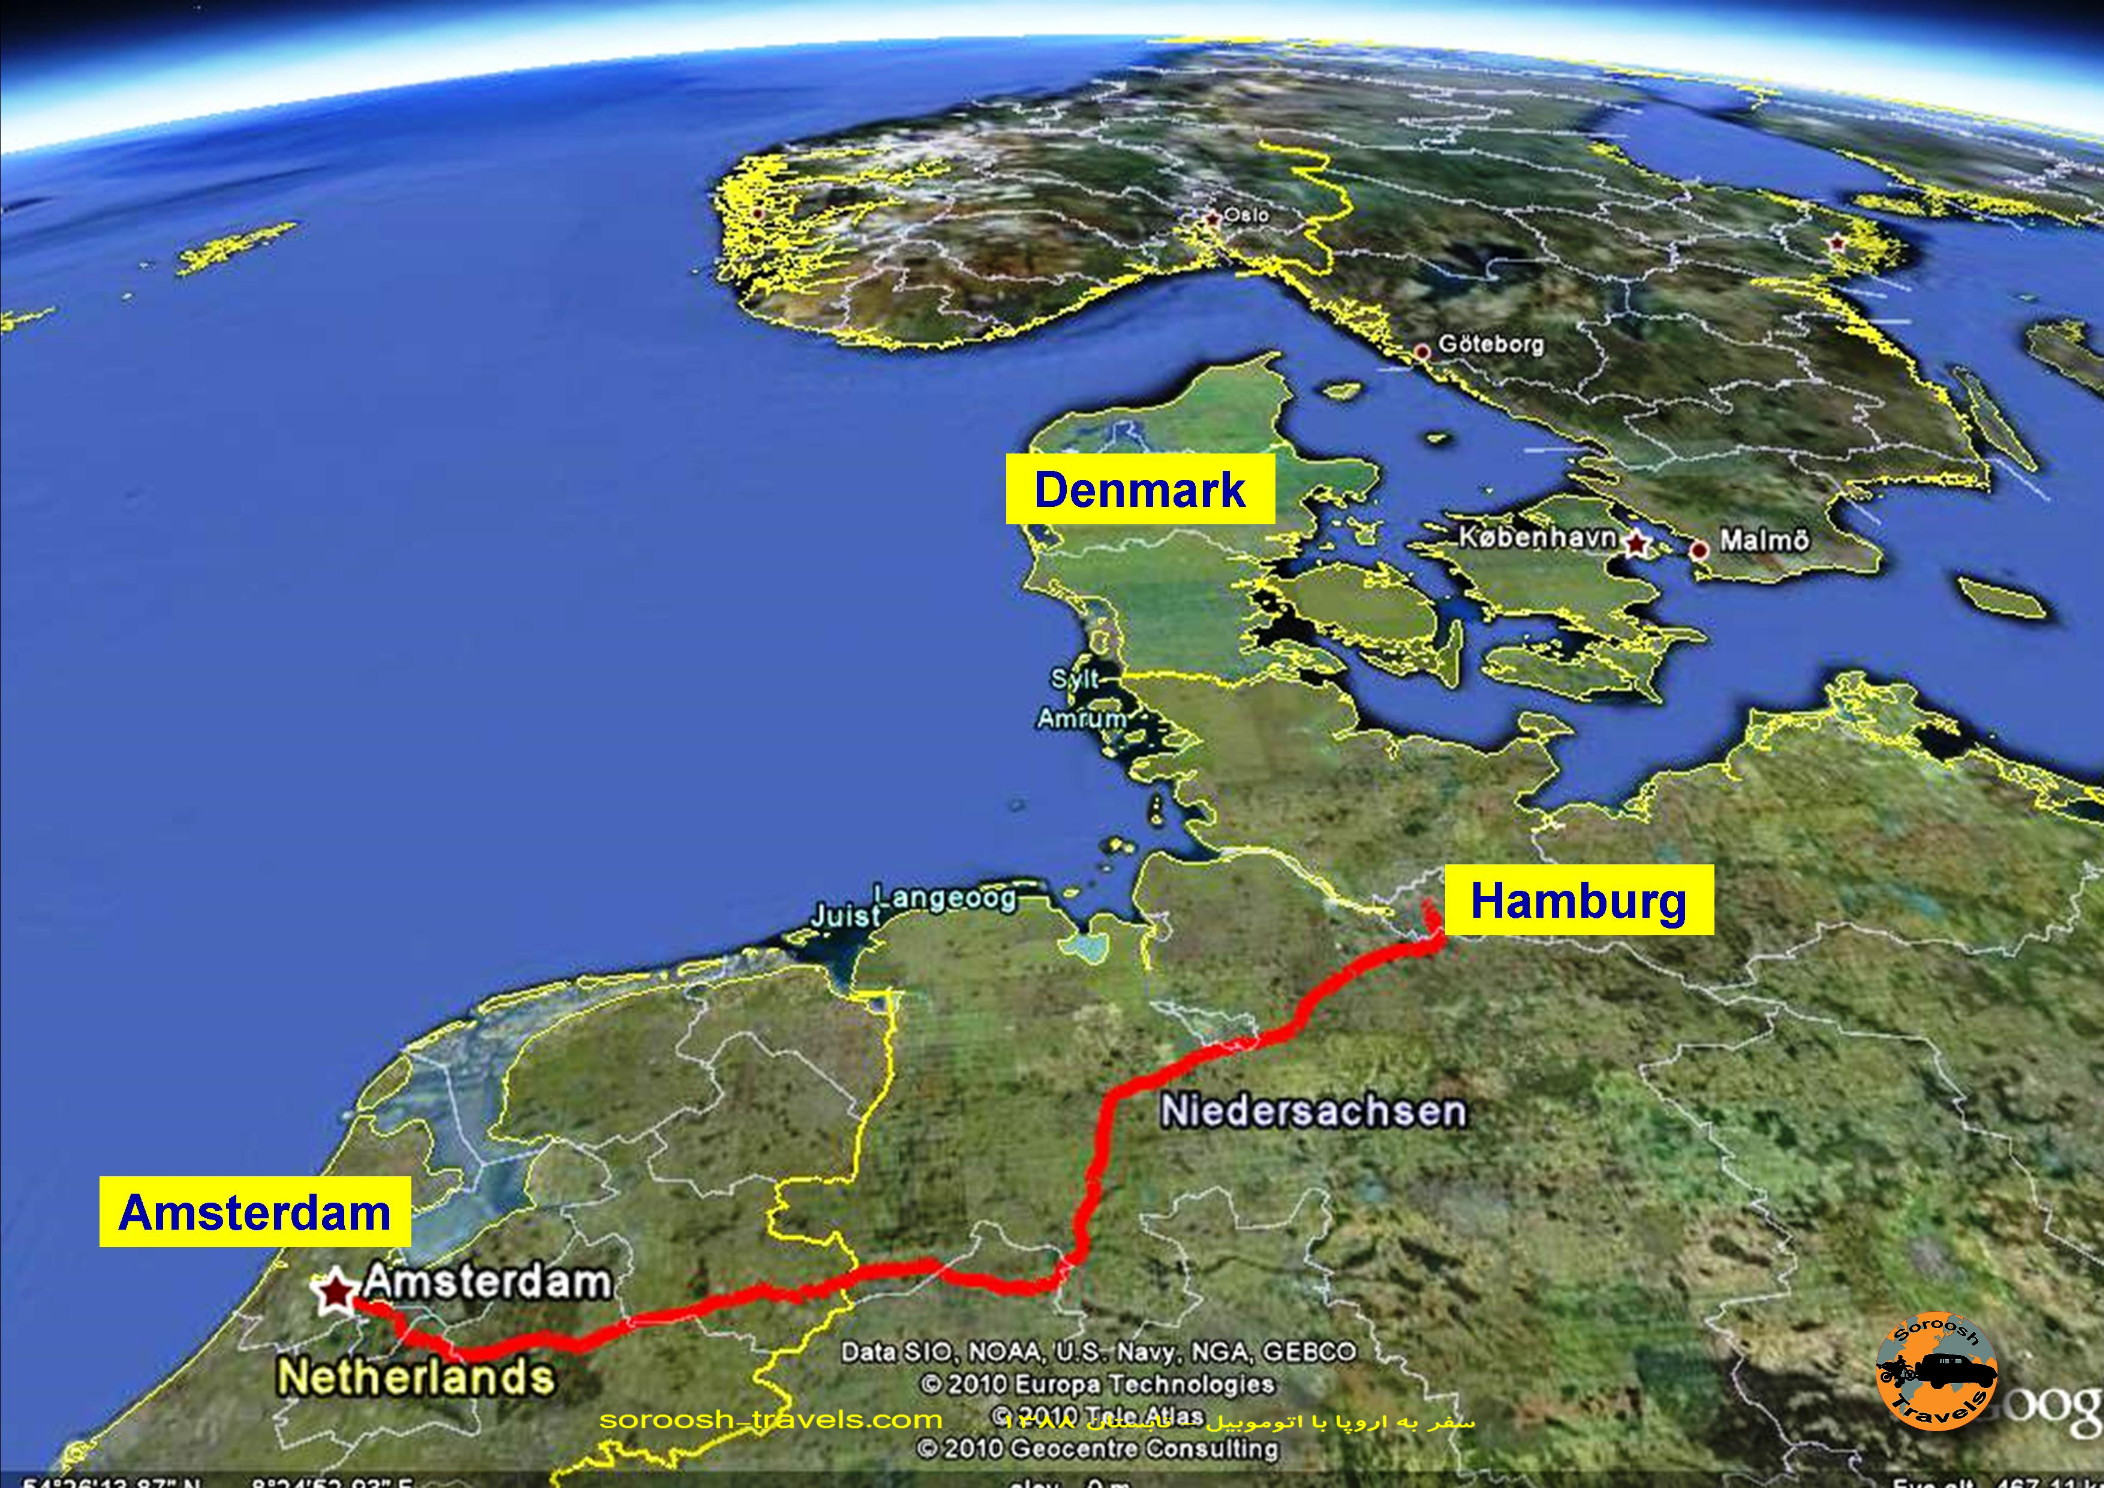 25-shahrivar-1388-16-september-2009-amsterdam-in-netherland-to-hamburg-in-germany-4